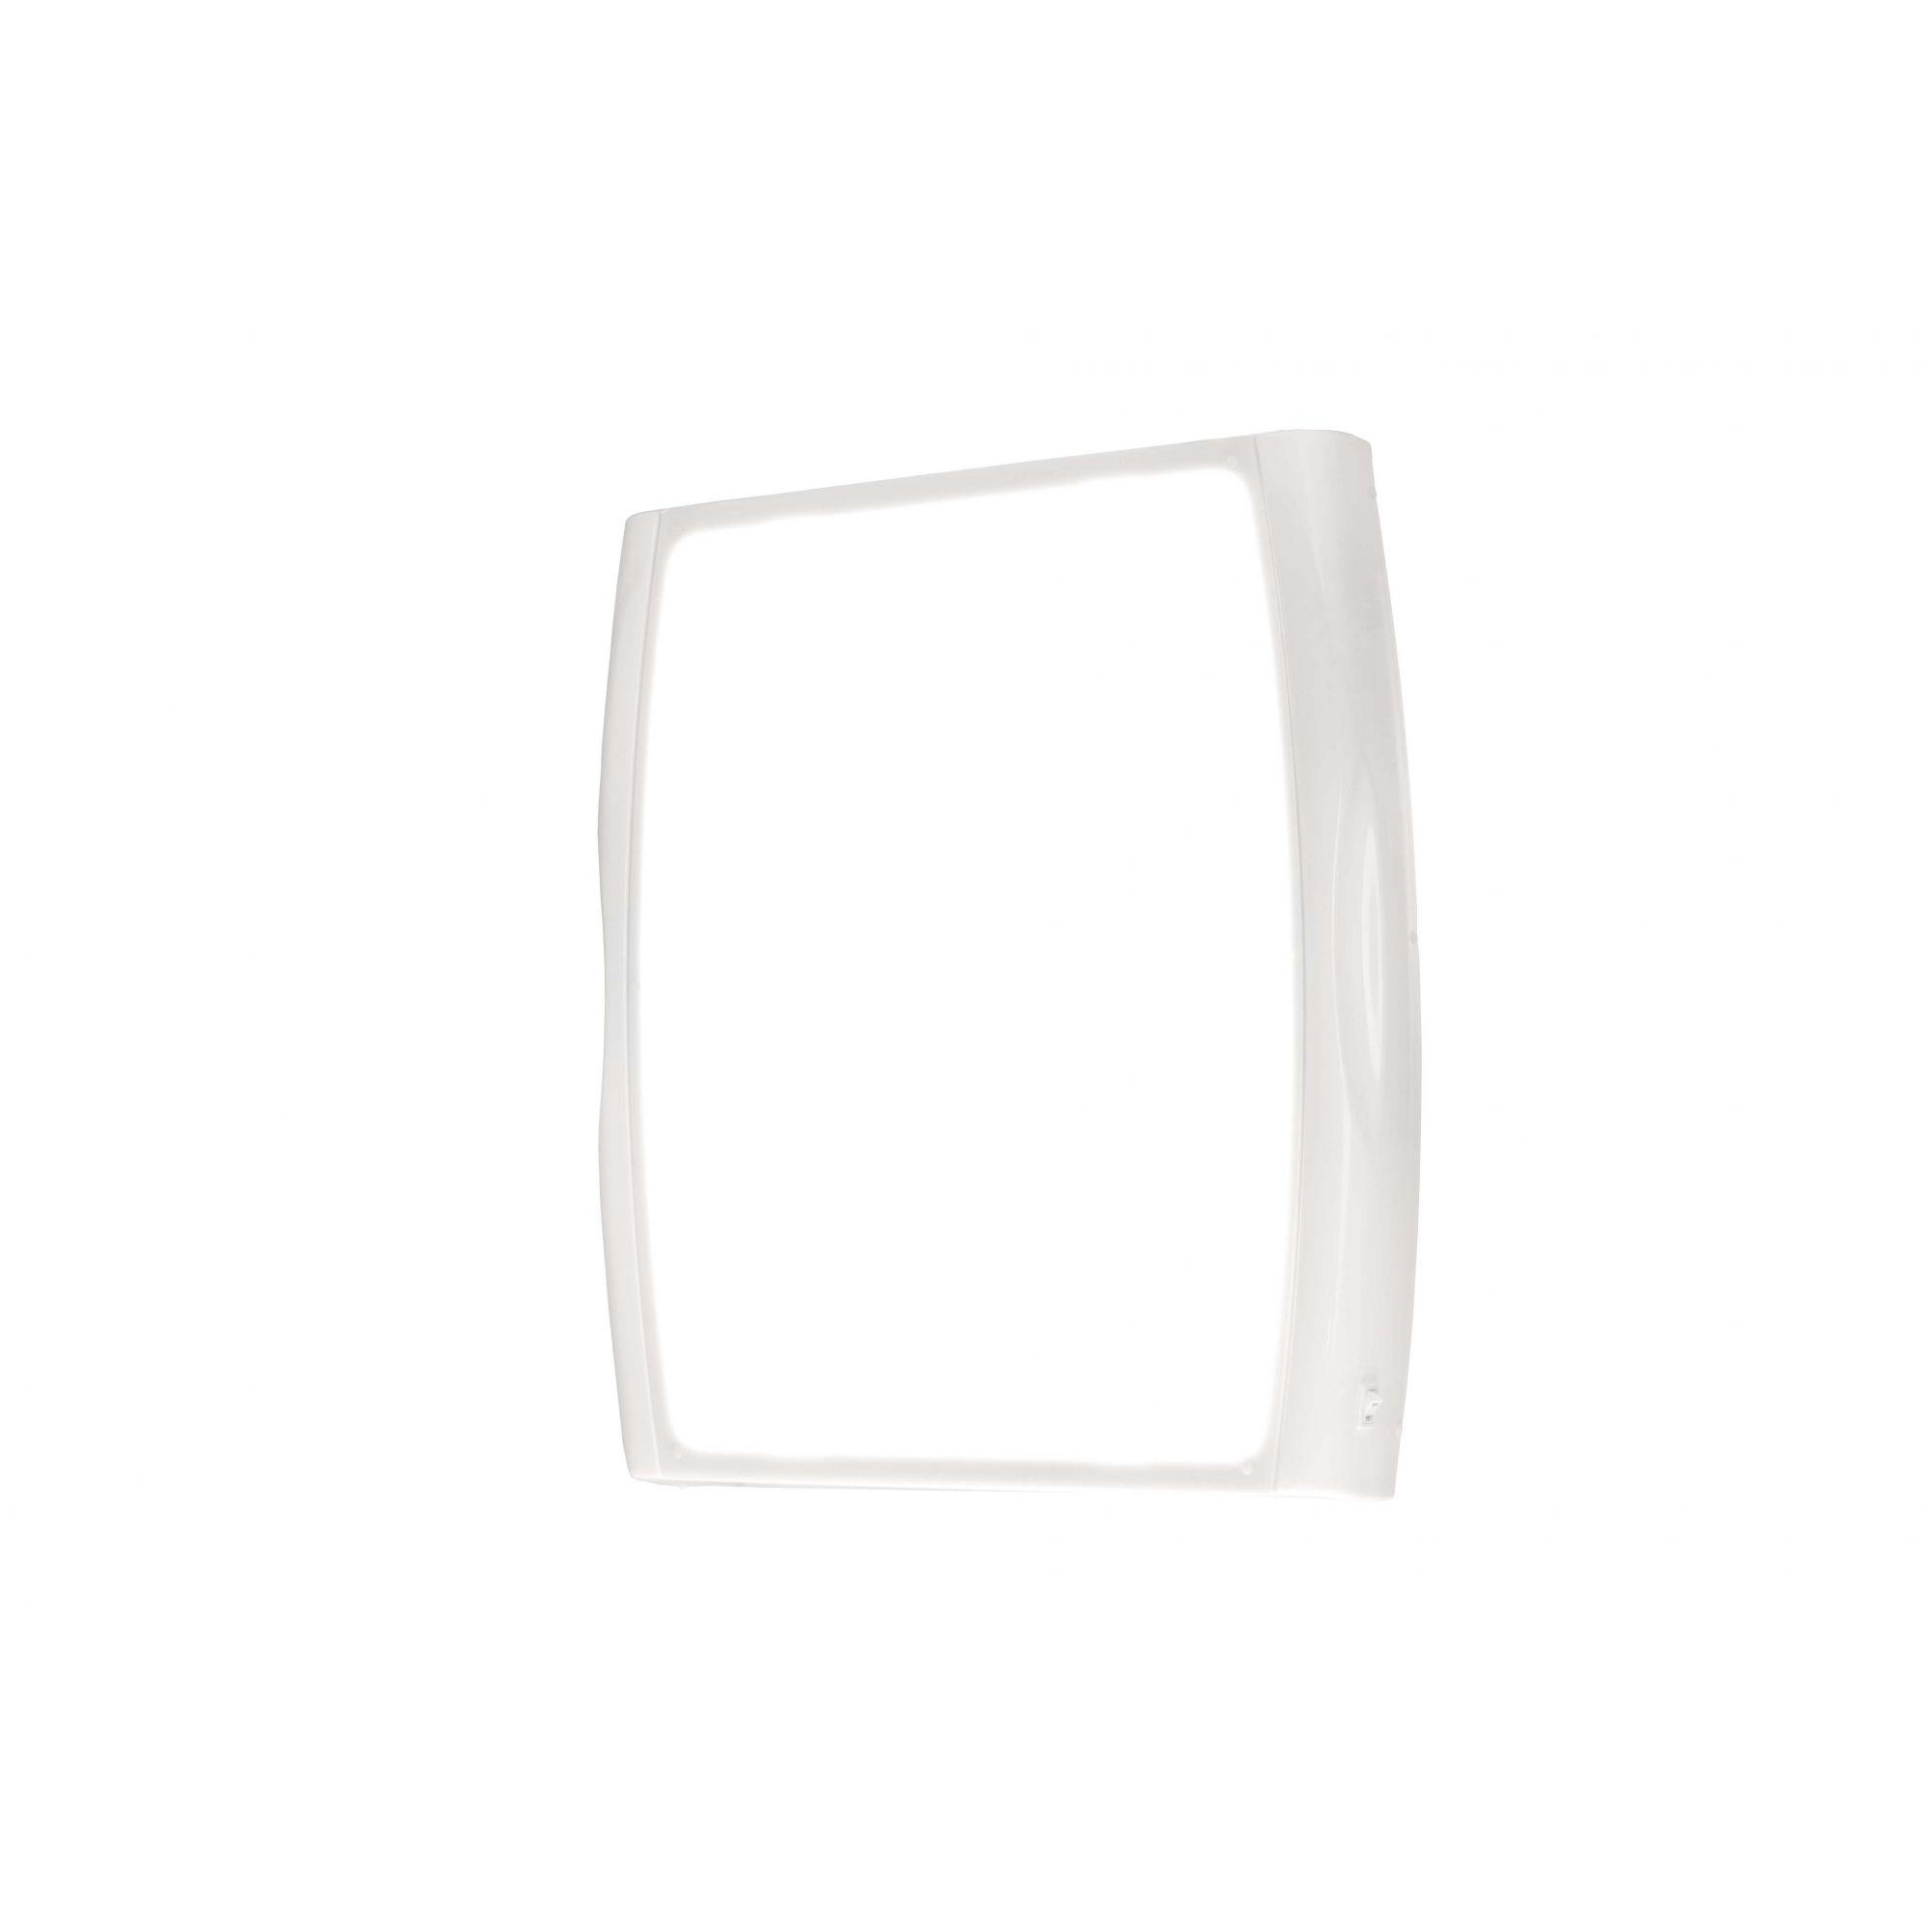 Negatoscópio Tomográfico Slim / Clínico - Biotron